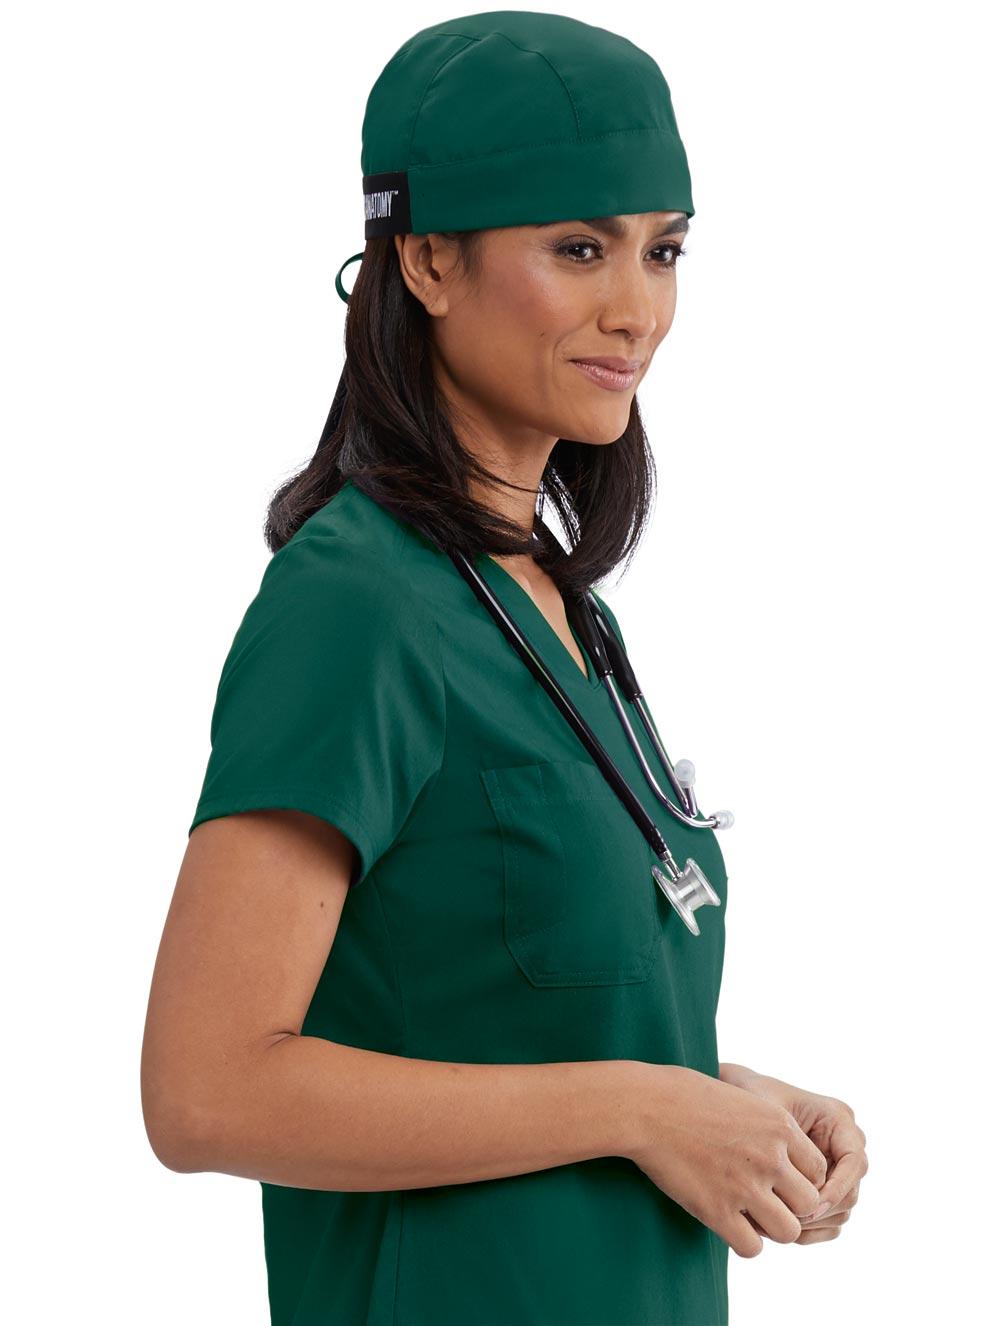 'Grey's Anatomy' Giving Scrub Cap